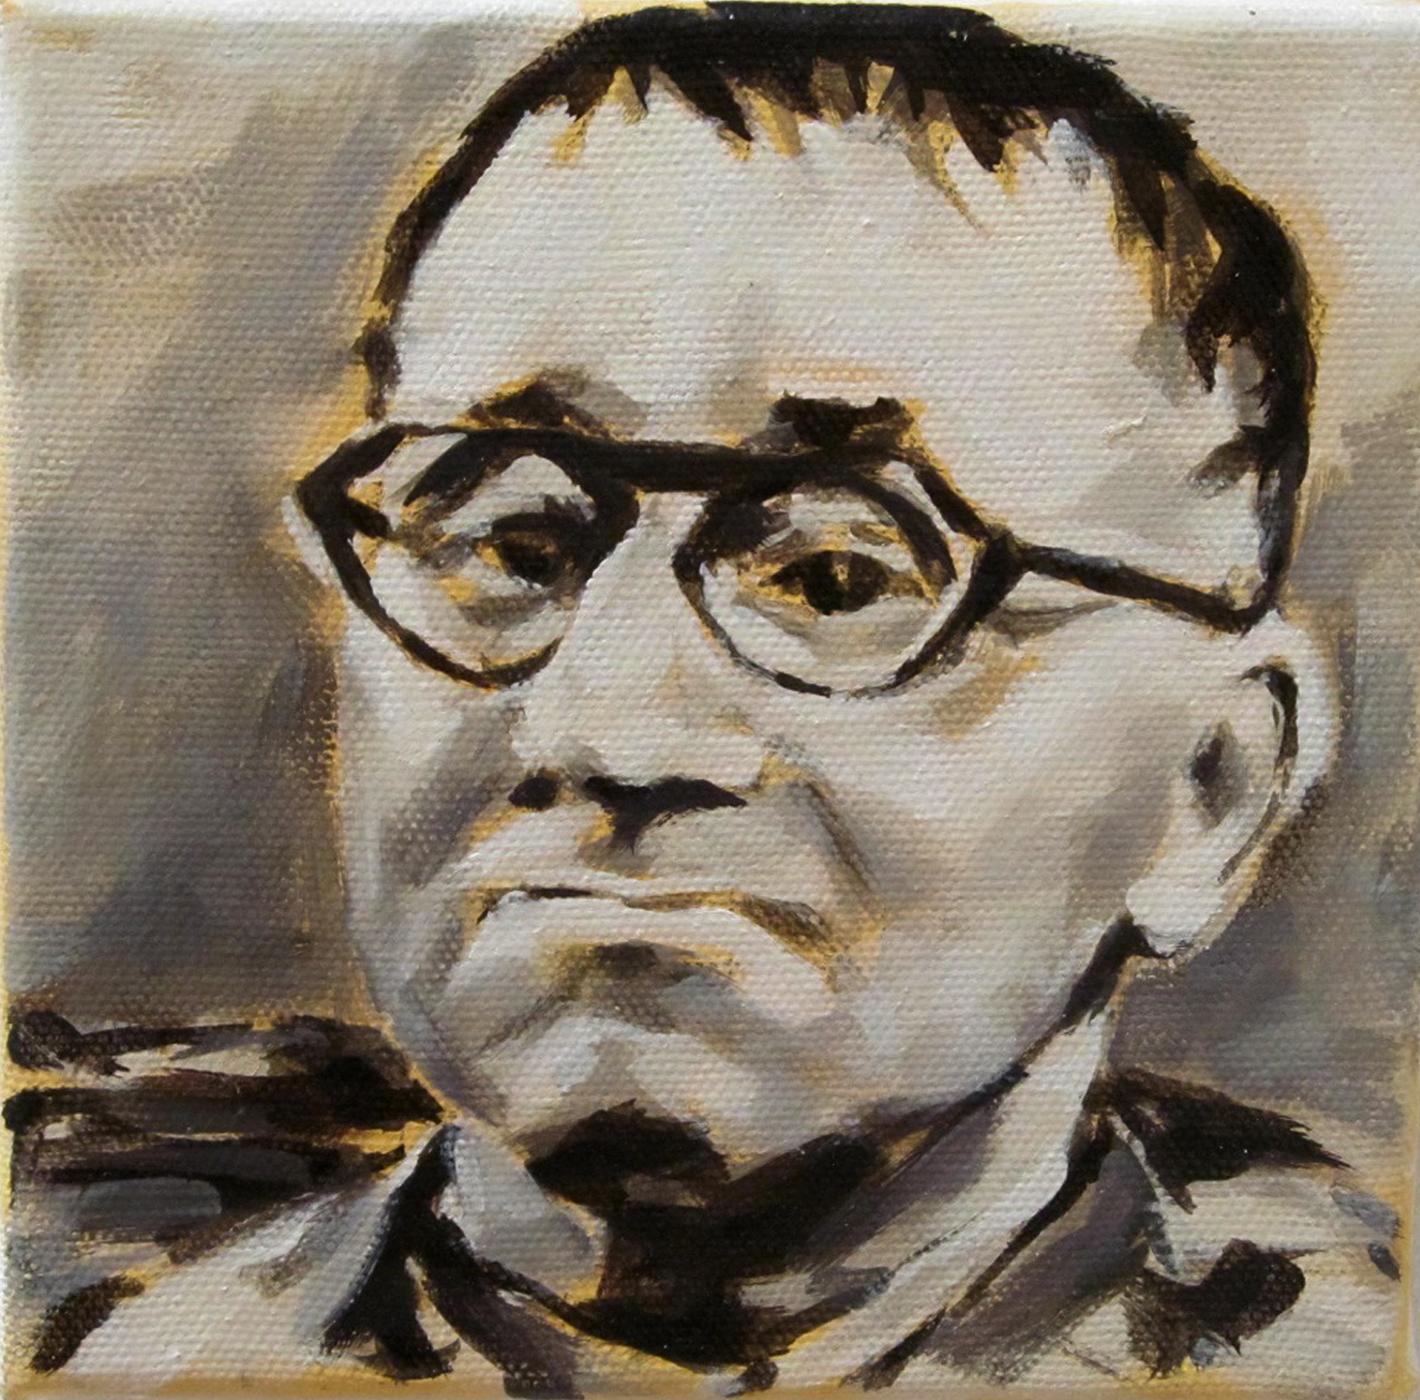 Berthold Brecht, Öl auf Leinwand, 20x20 cm, 2014